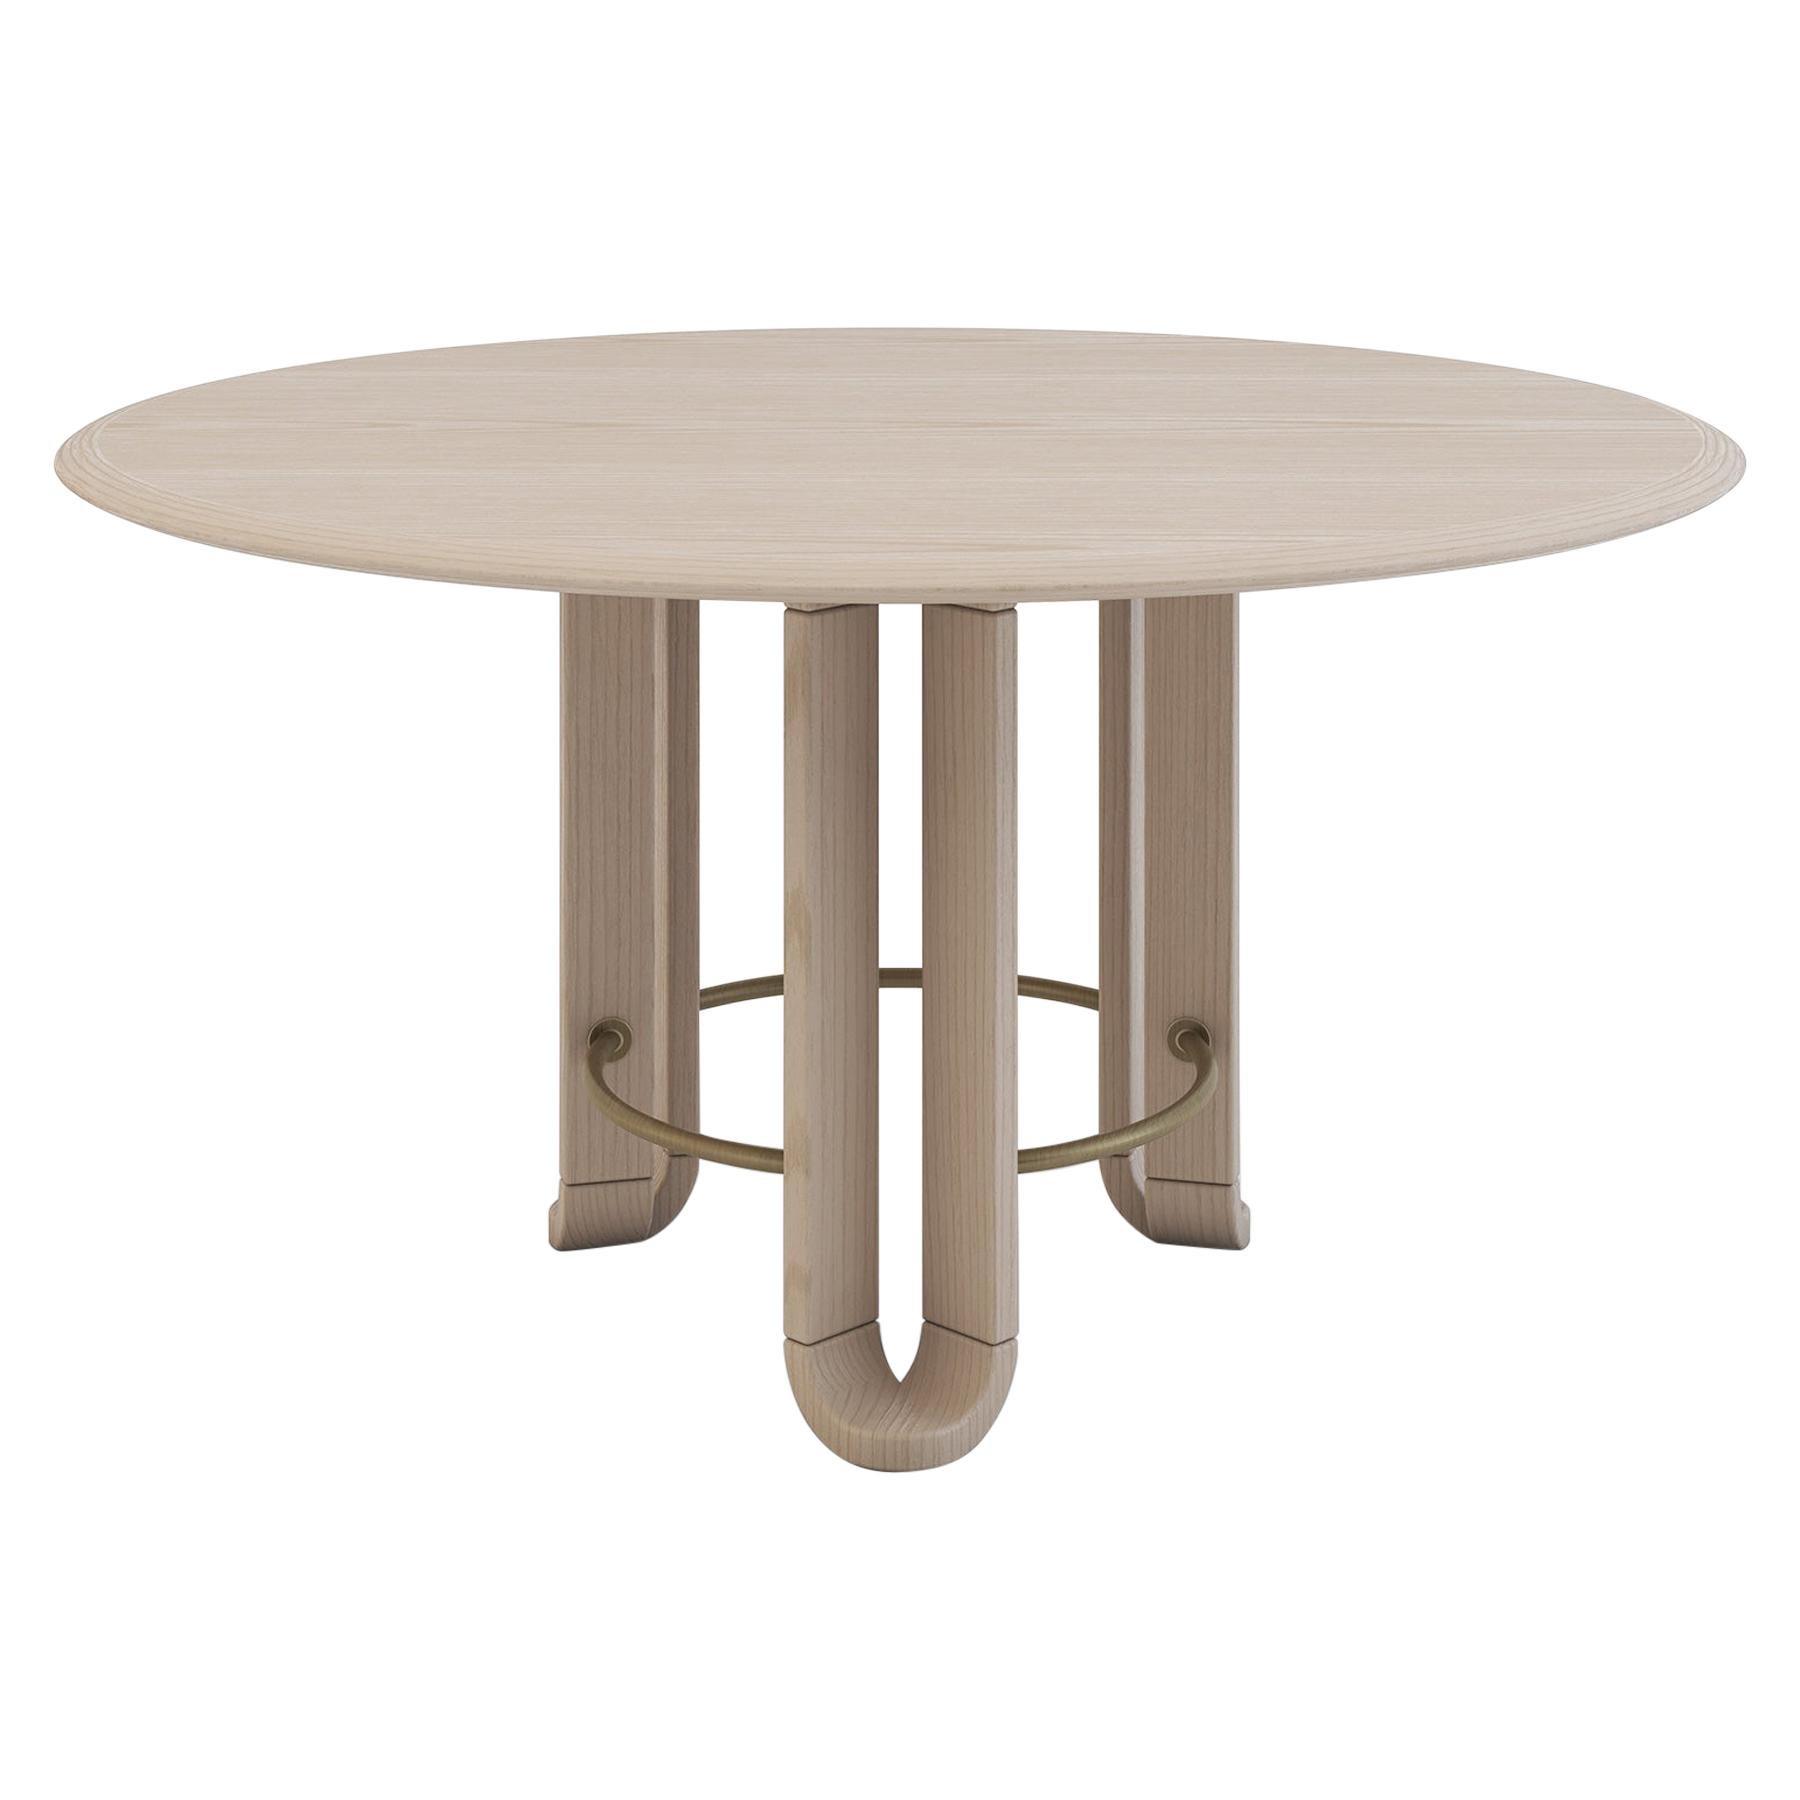 Unique Round Yaprak Dining Table by Feyzstudio